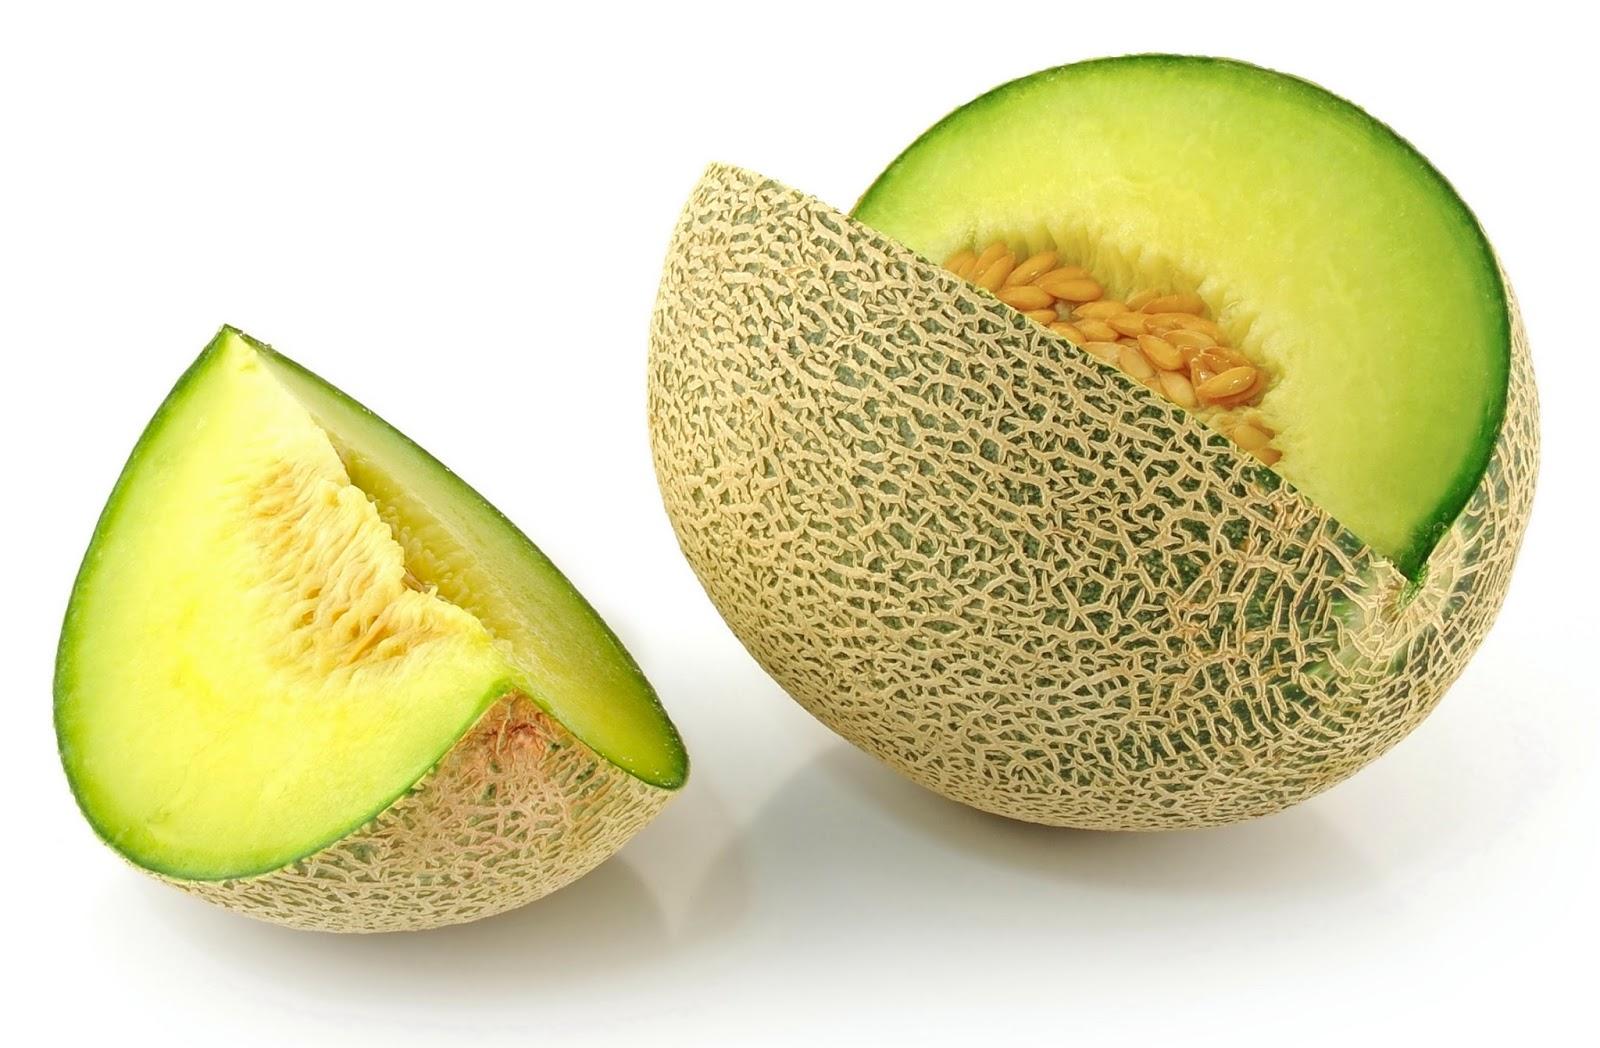 Manfaat dan Khasiat Buah Melon